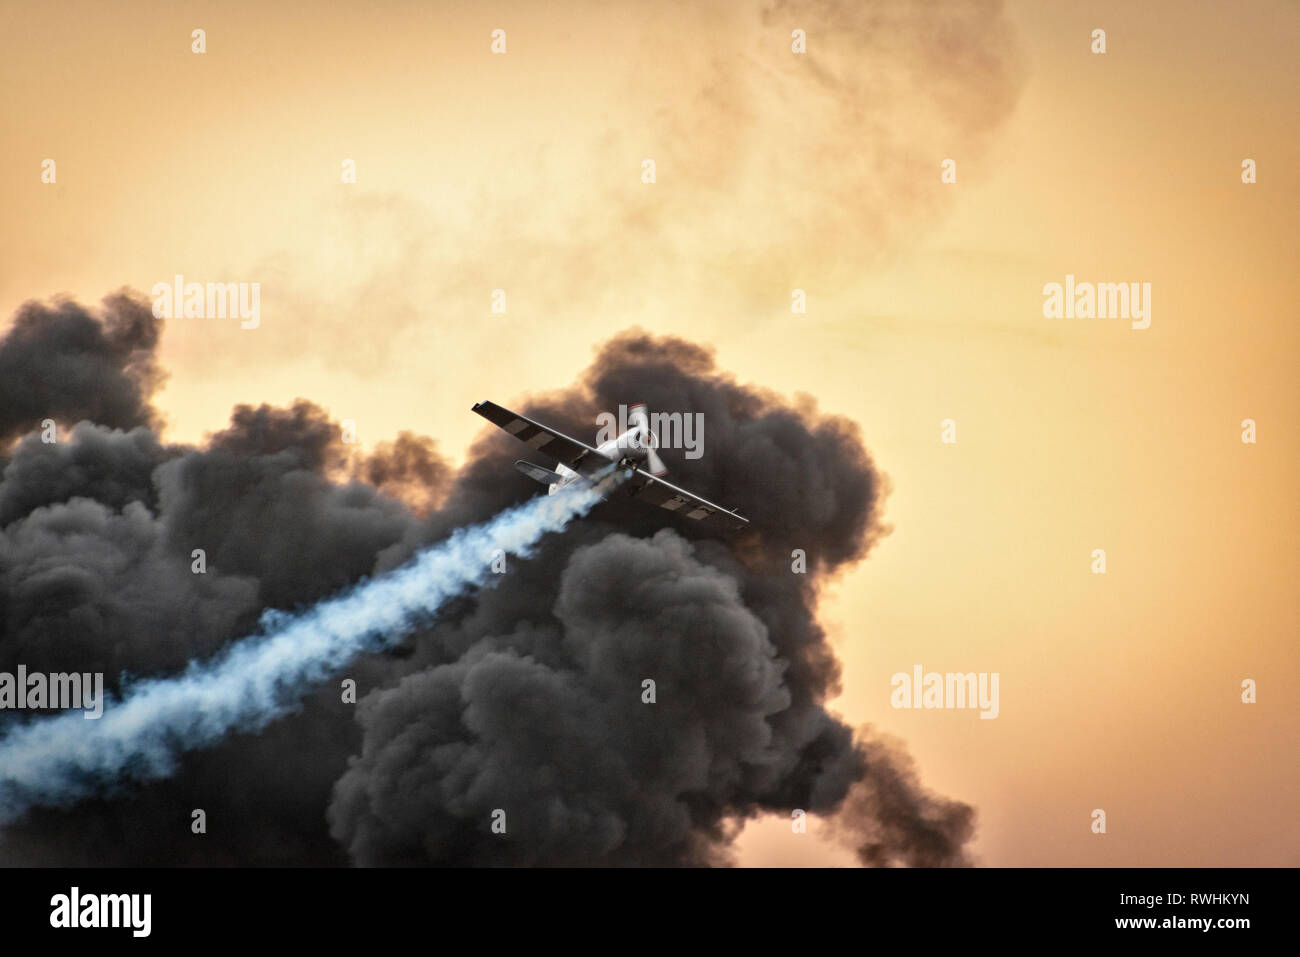 Yak-50 aerobatic plane flying through a cloud of smoke at an airshow - Stock Image